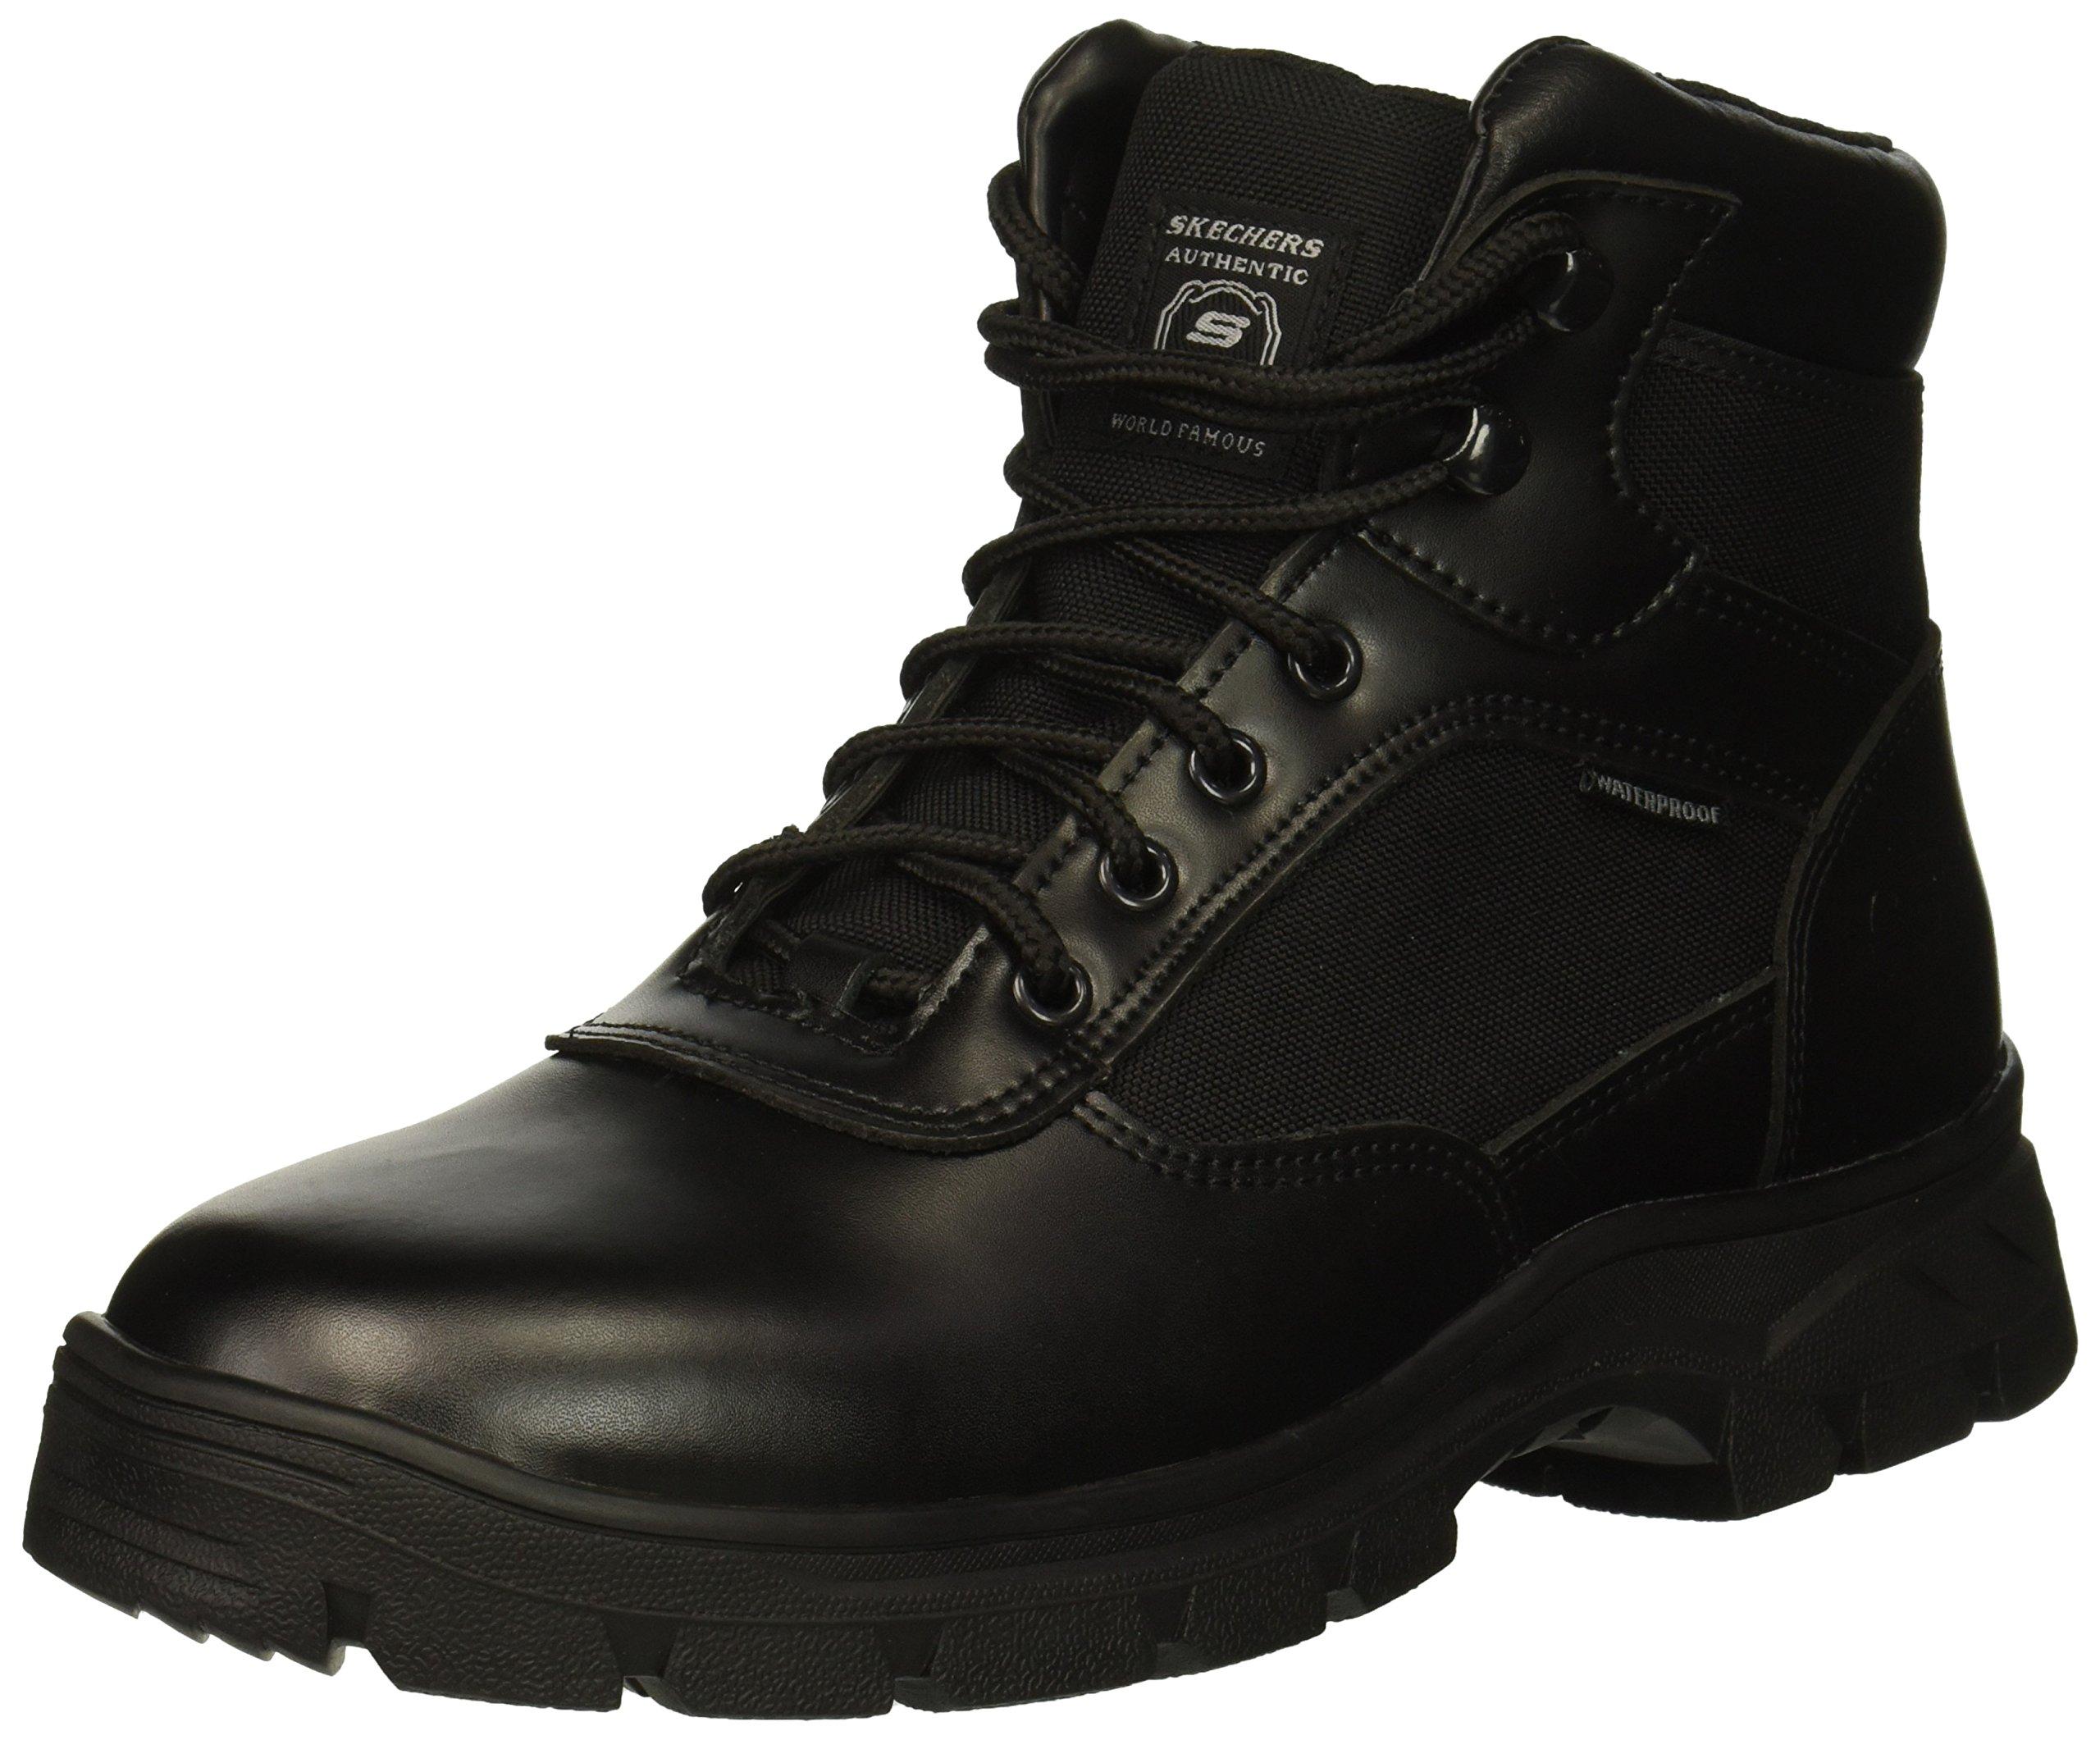 Skechers Men's Wascana Industrial Boot, Black Leather Textile, 11 M US